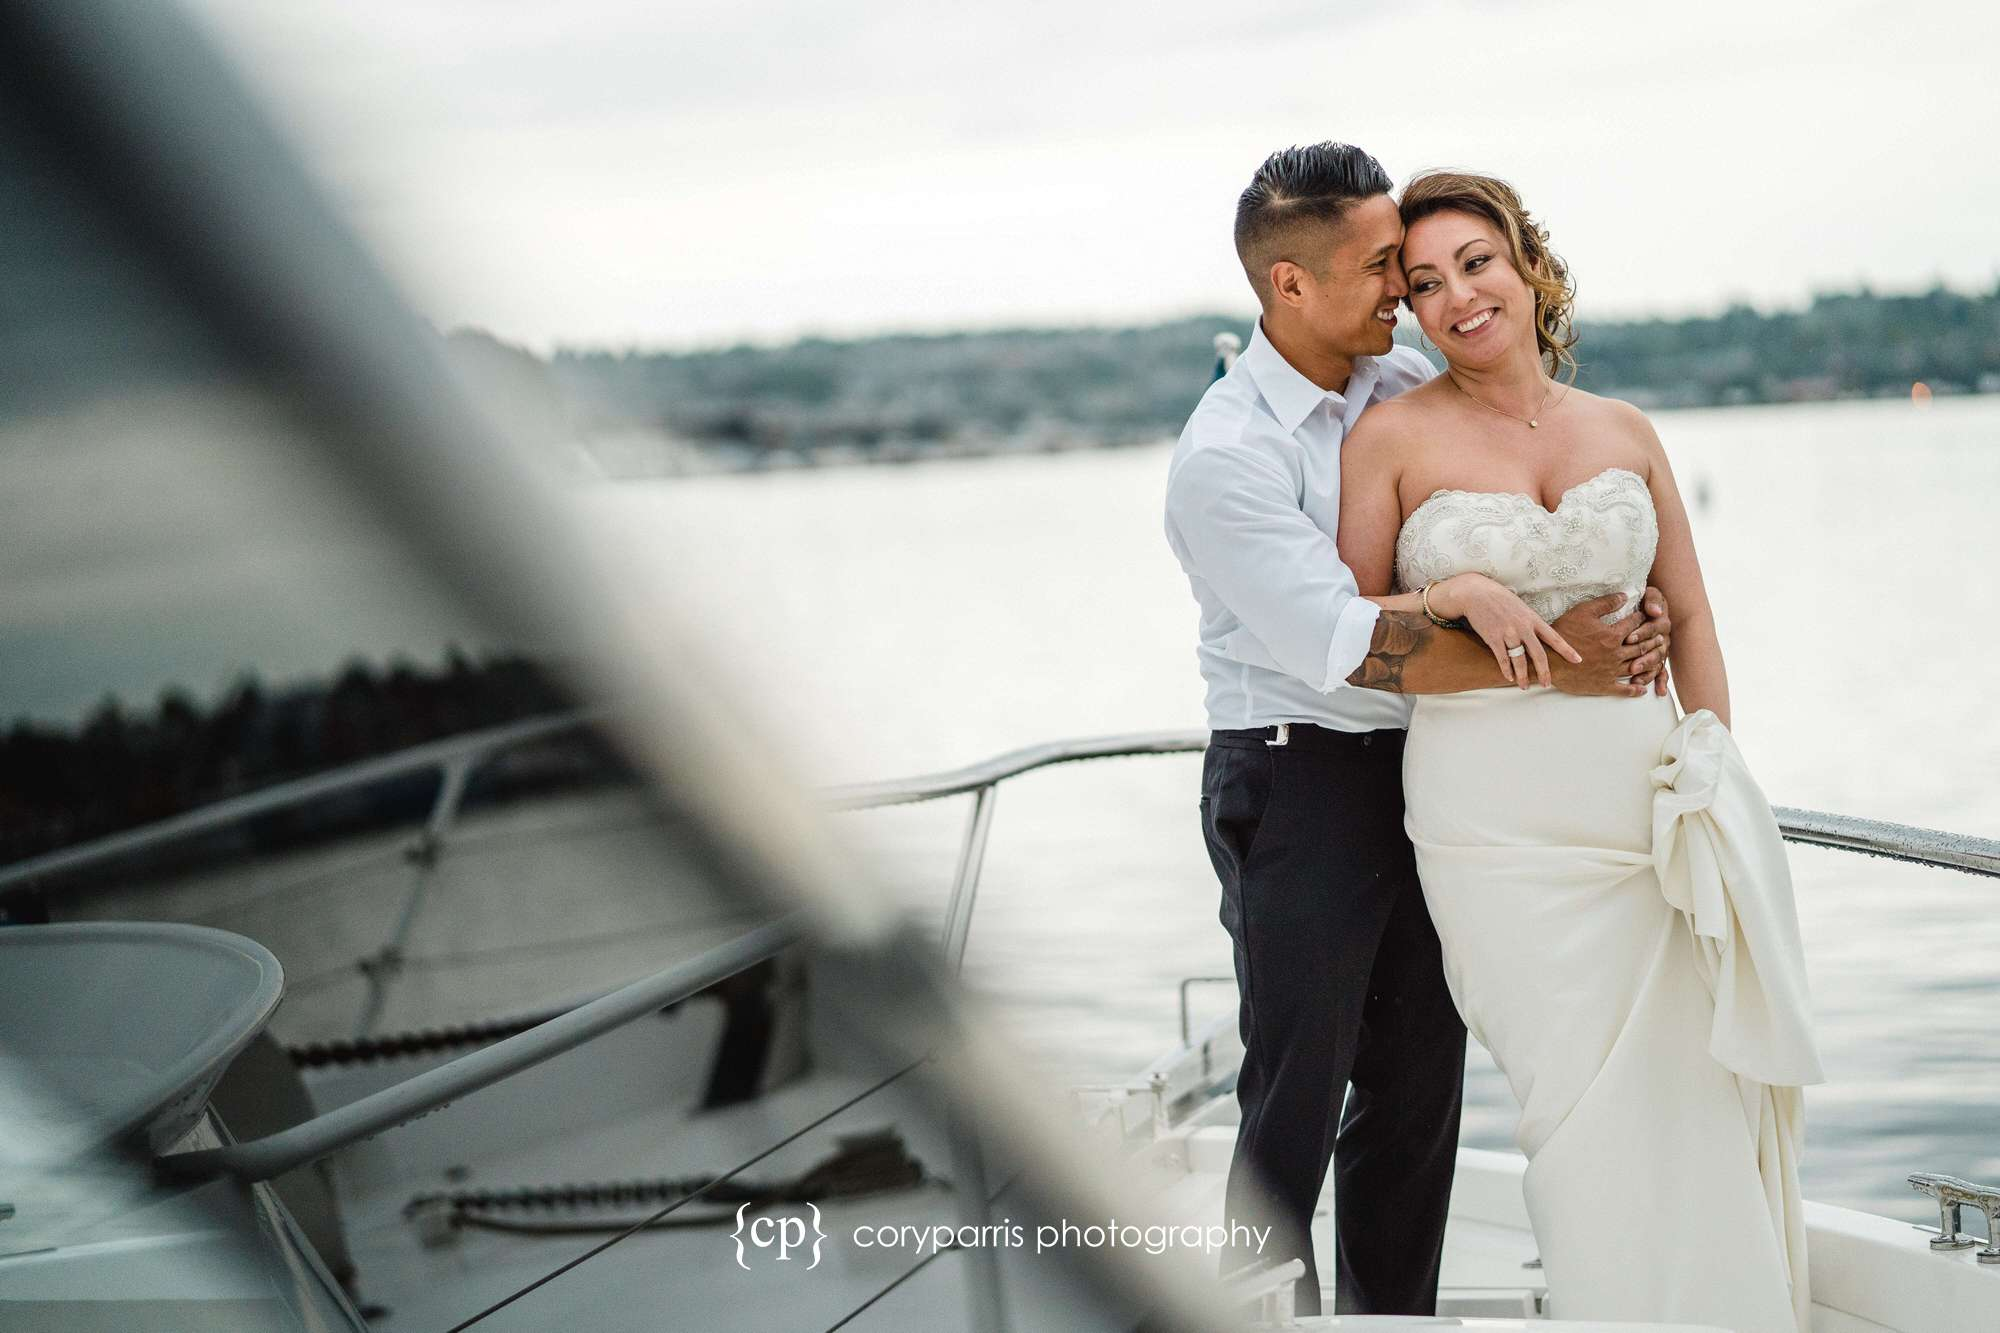 531-seattle-courthouse-wedding-photography.jpg